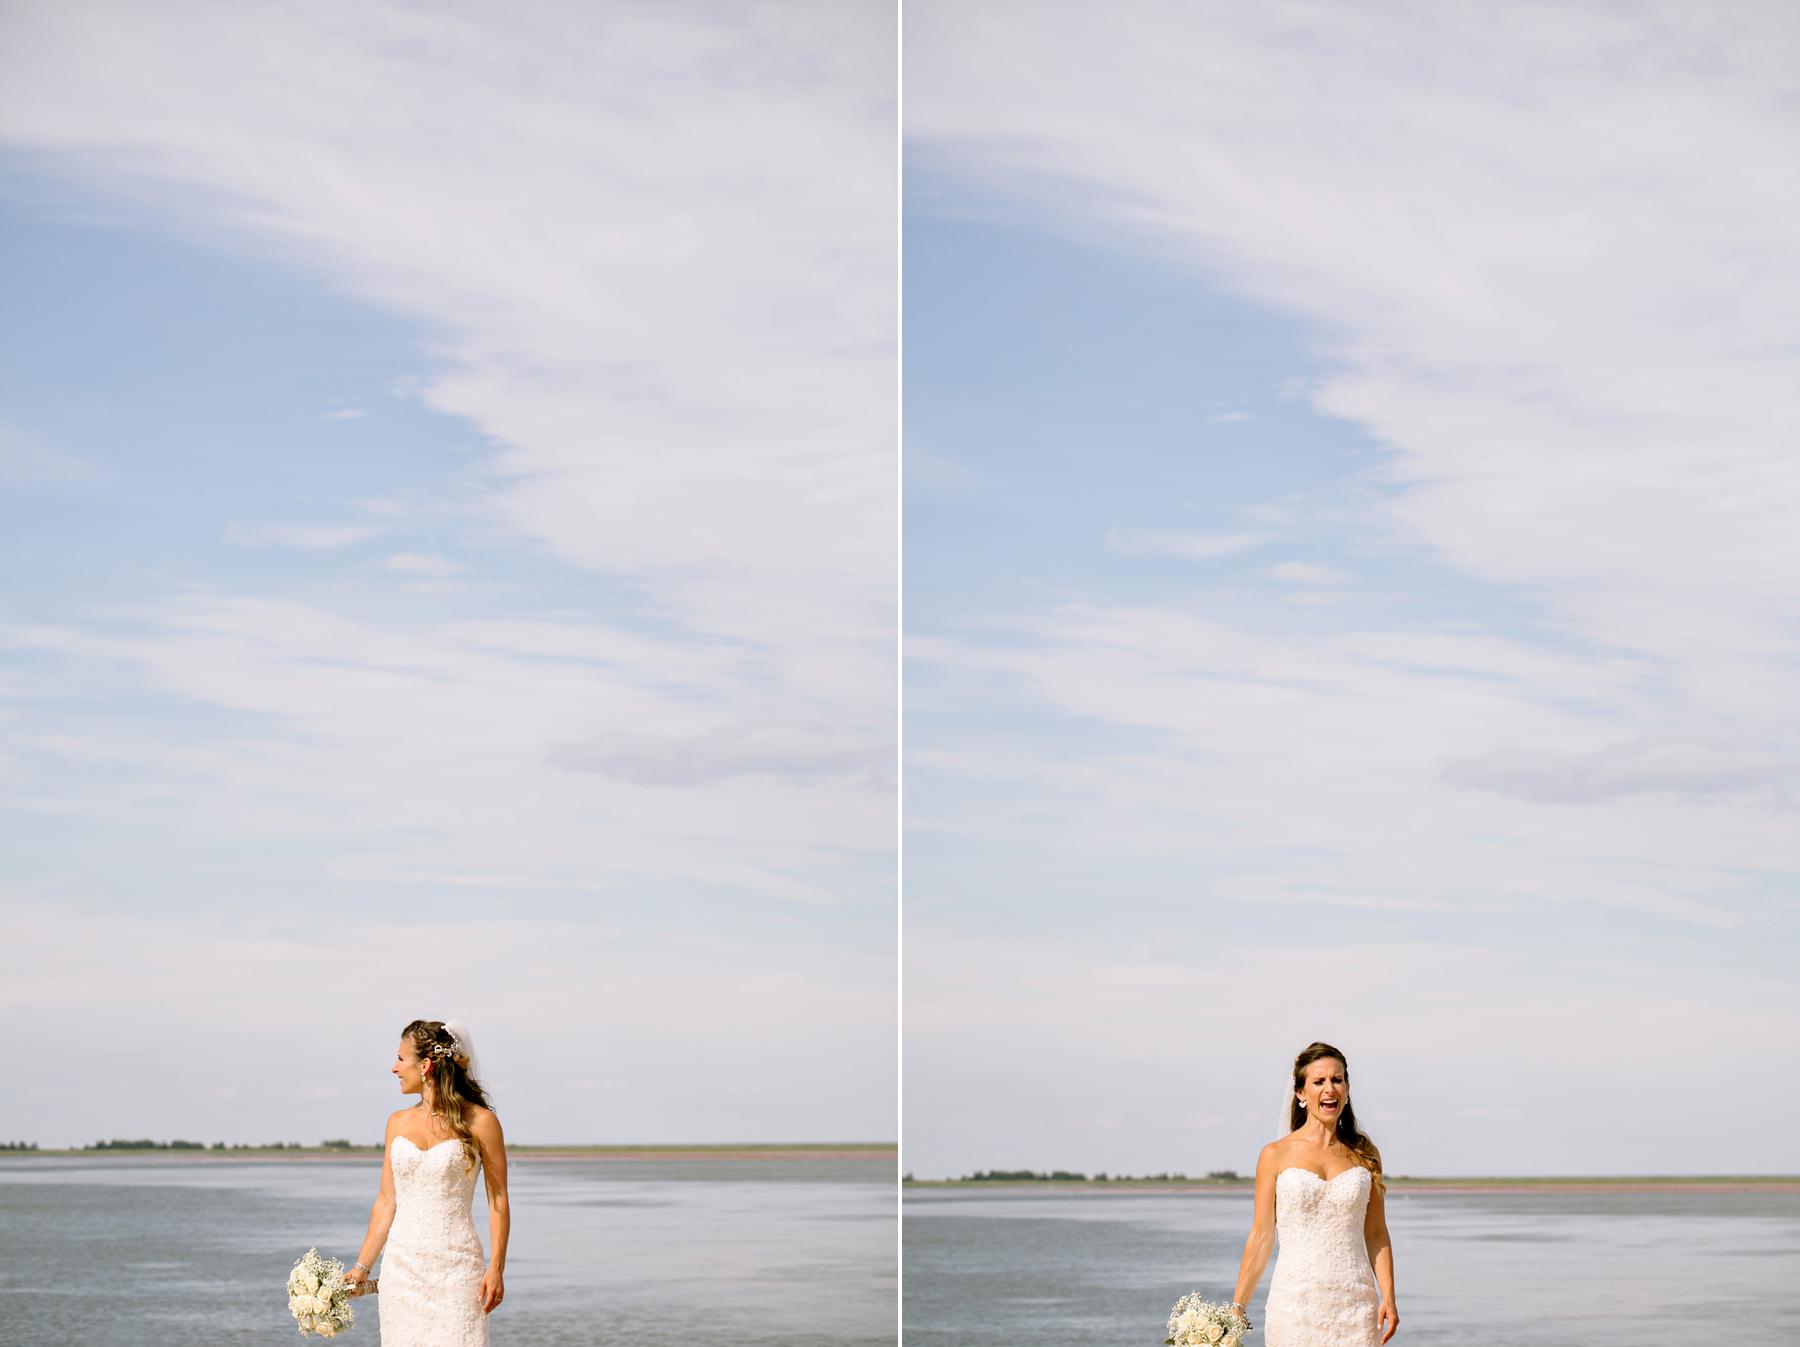 028-awesome-pei-wedding-photography-kandisebrown